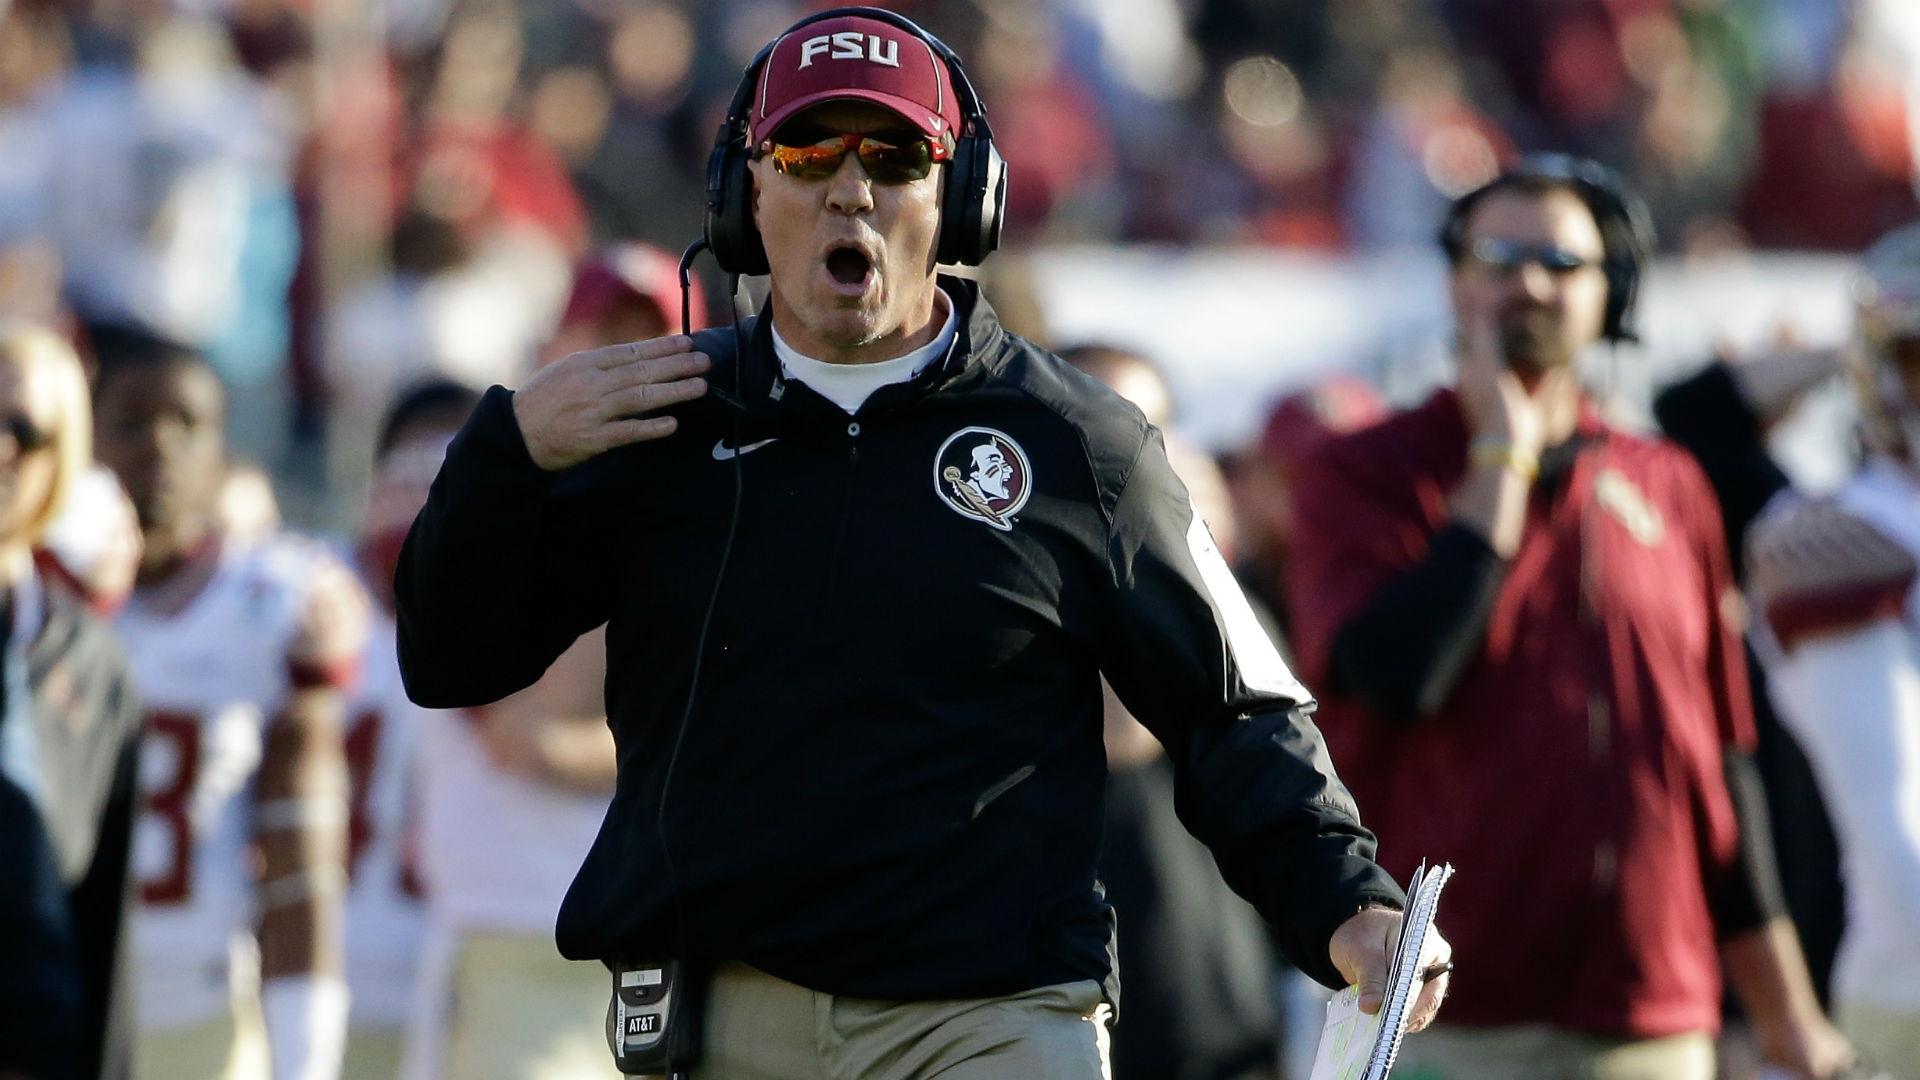 Jimbo Fisher regains control when Seminoles take field